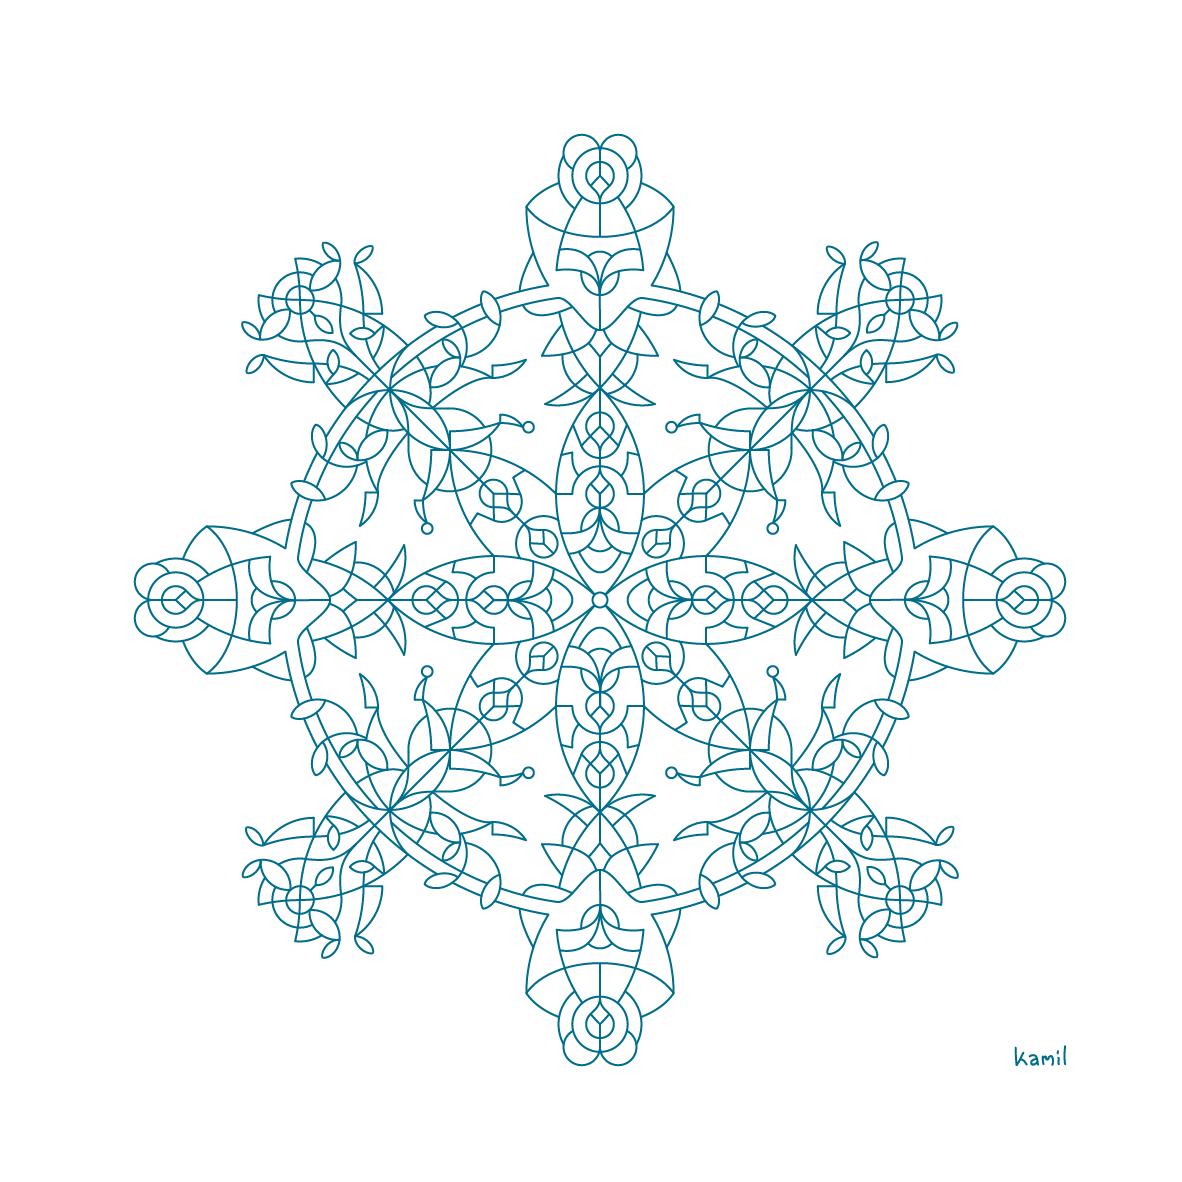 Illustration – Lines in Relation No. 6